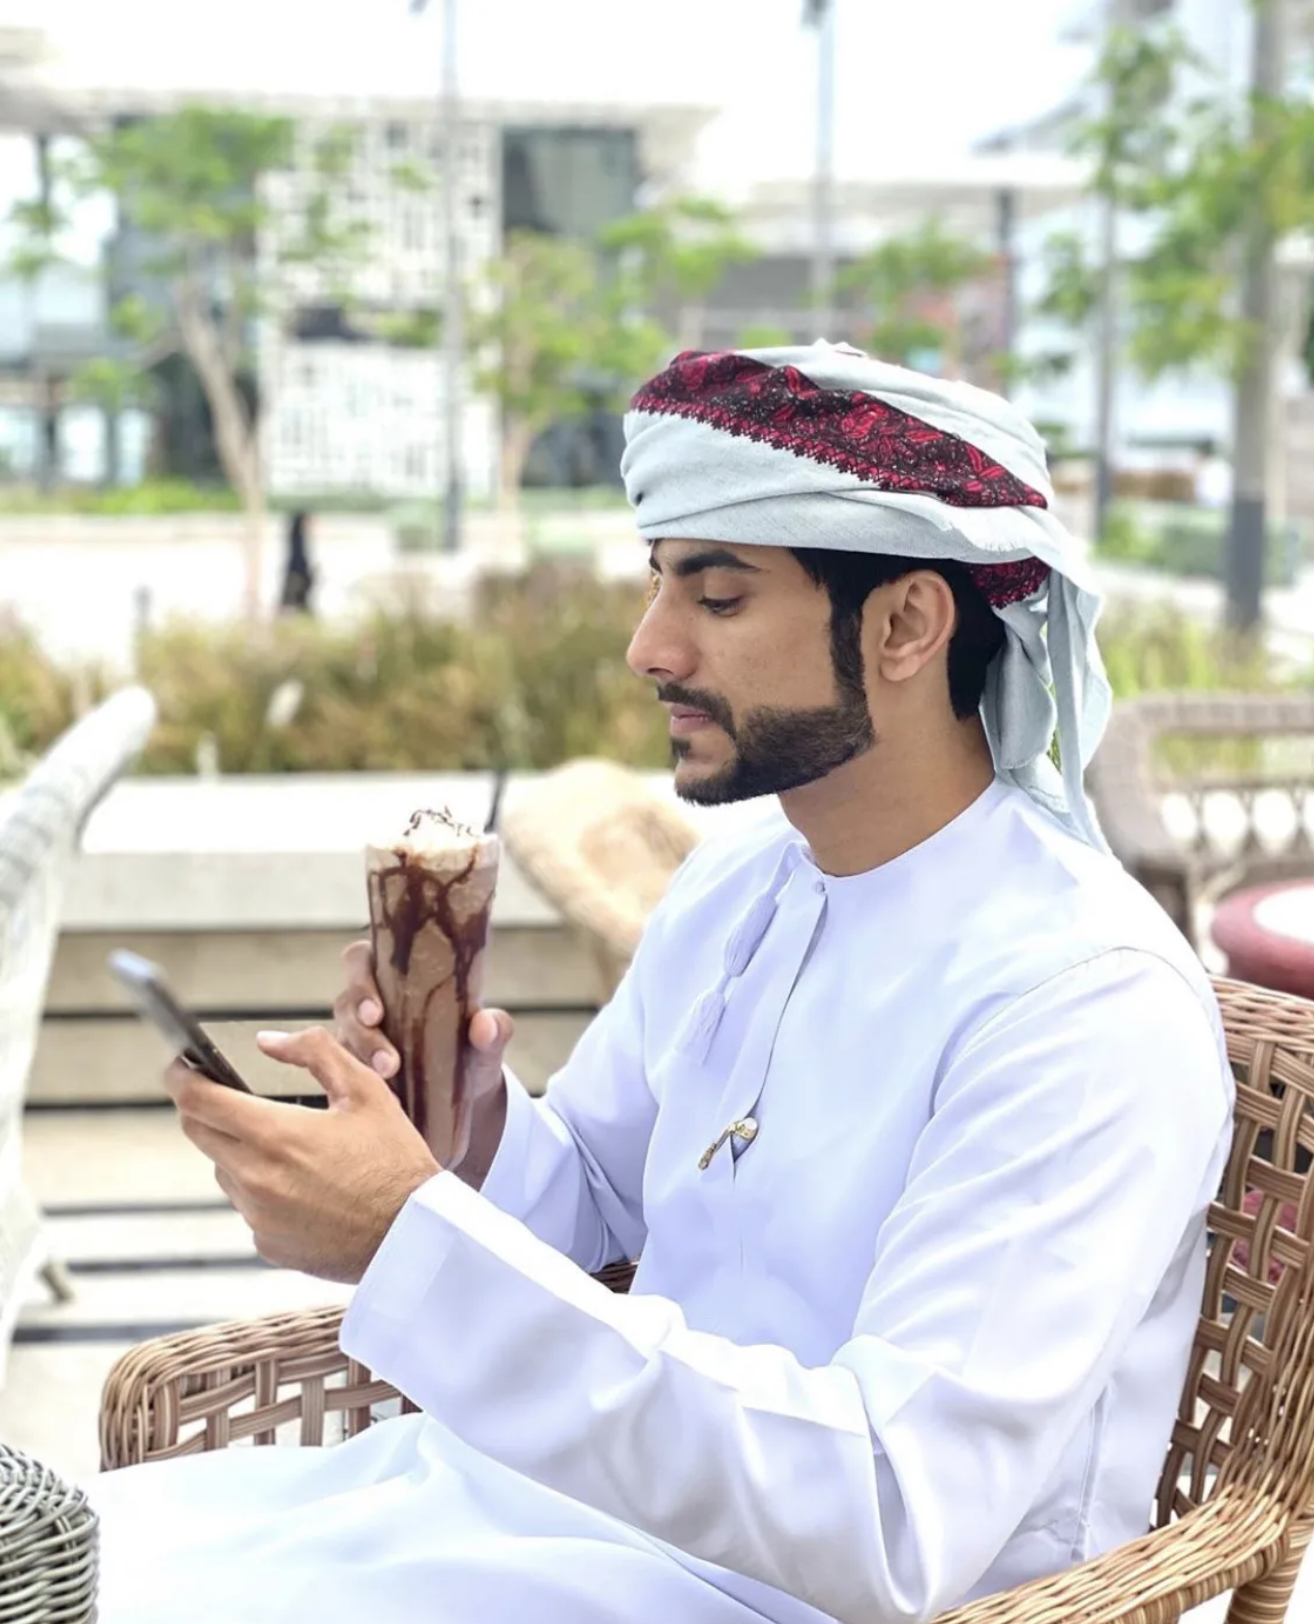 Dr. Salim Rashid Al Qamshoui Trends as the Popular Omani Doctor on Instagram